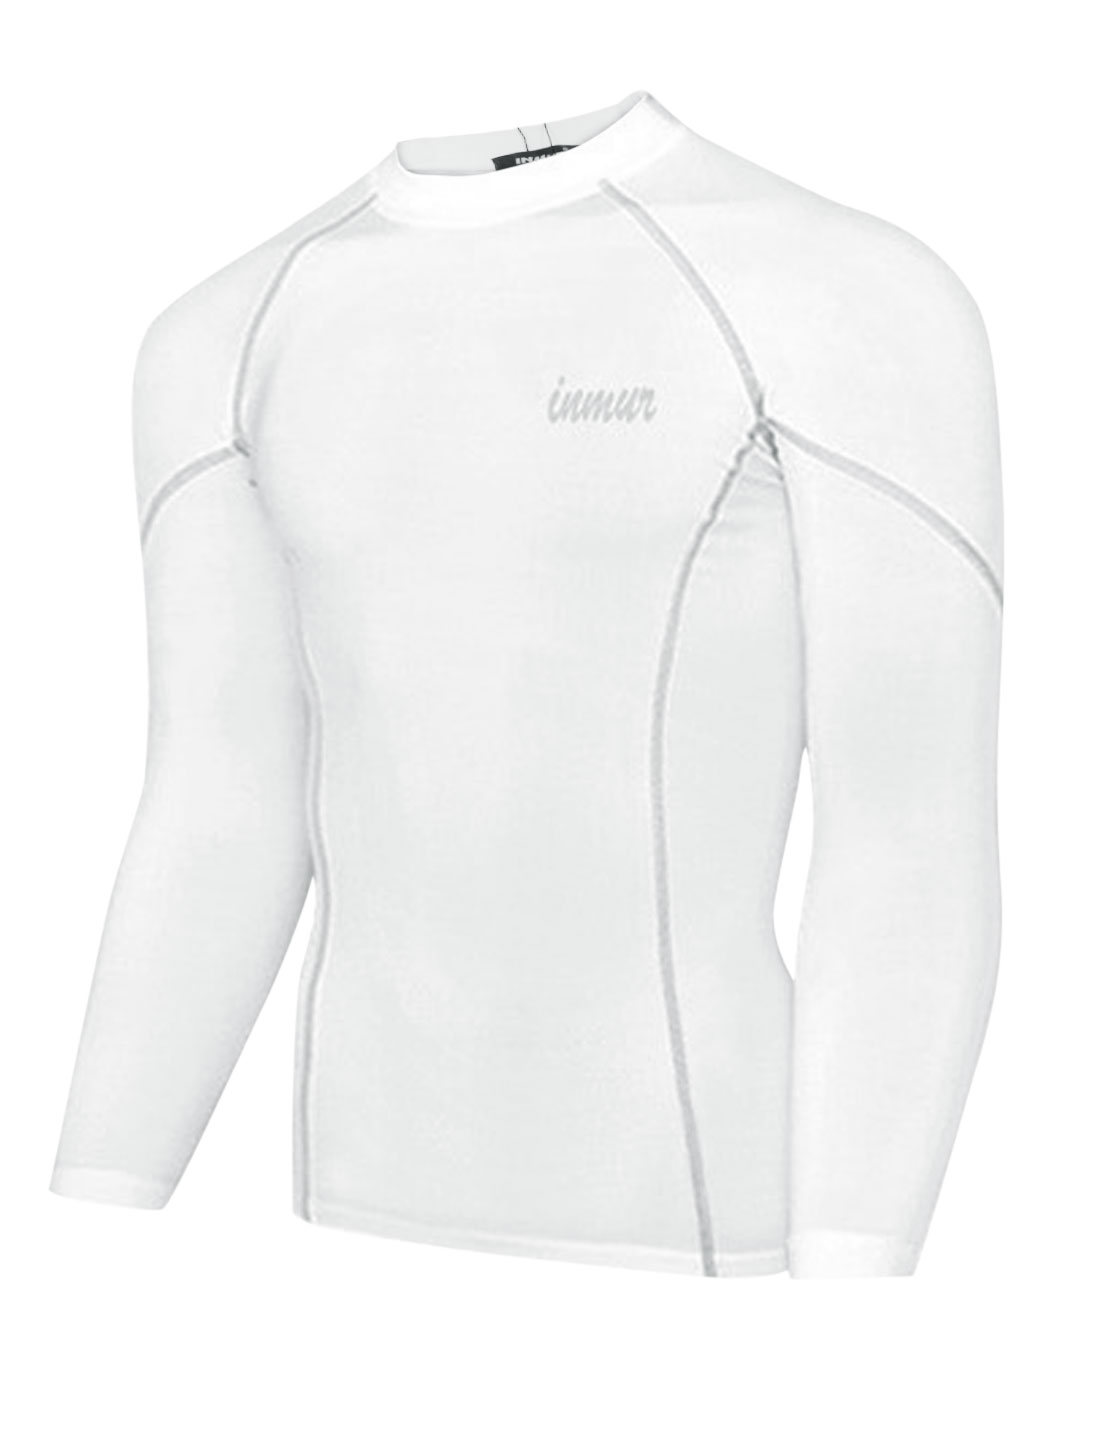 Men Pullover Raglan Sleeve Letters Detail Fitness Sports T-shirt White M